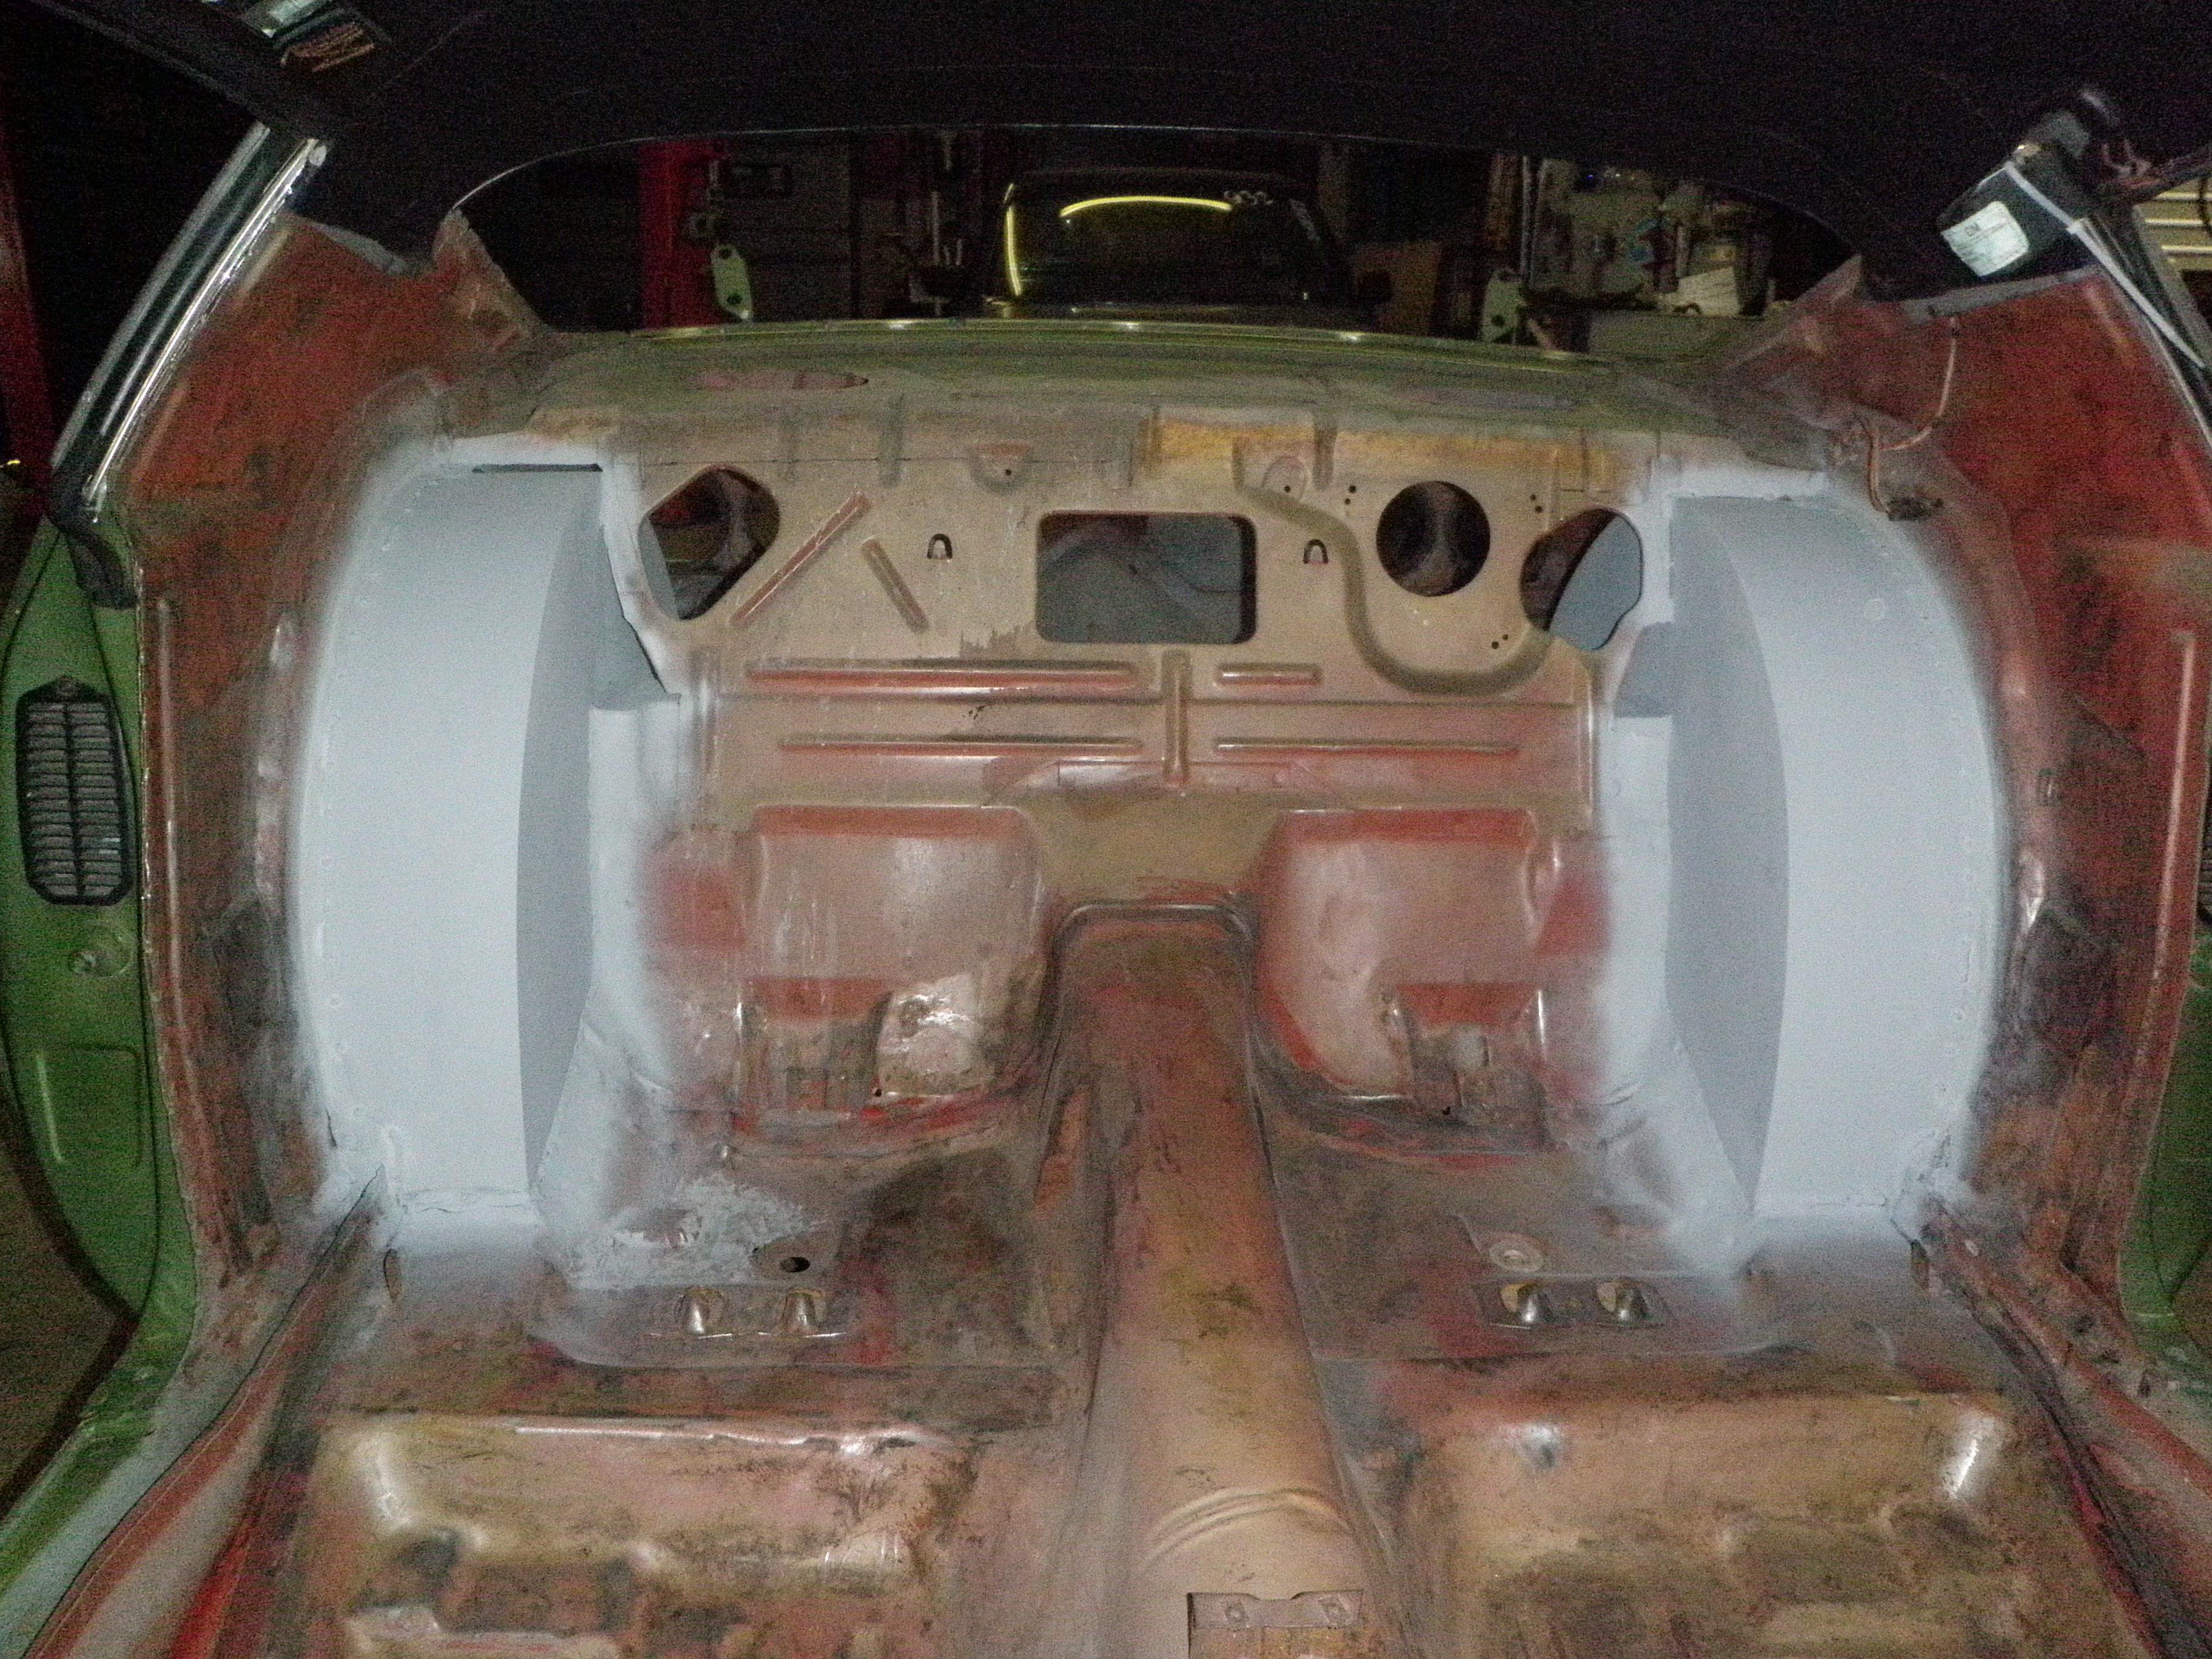 2nd Generation GM F-Body Mini Tubs - WILD RIDES